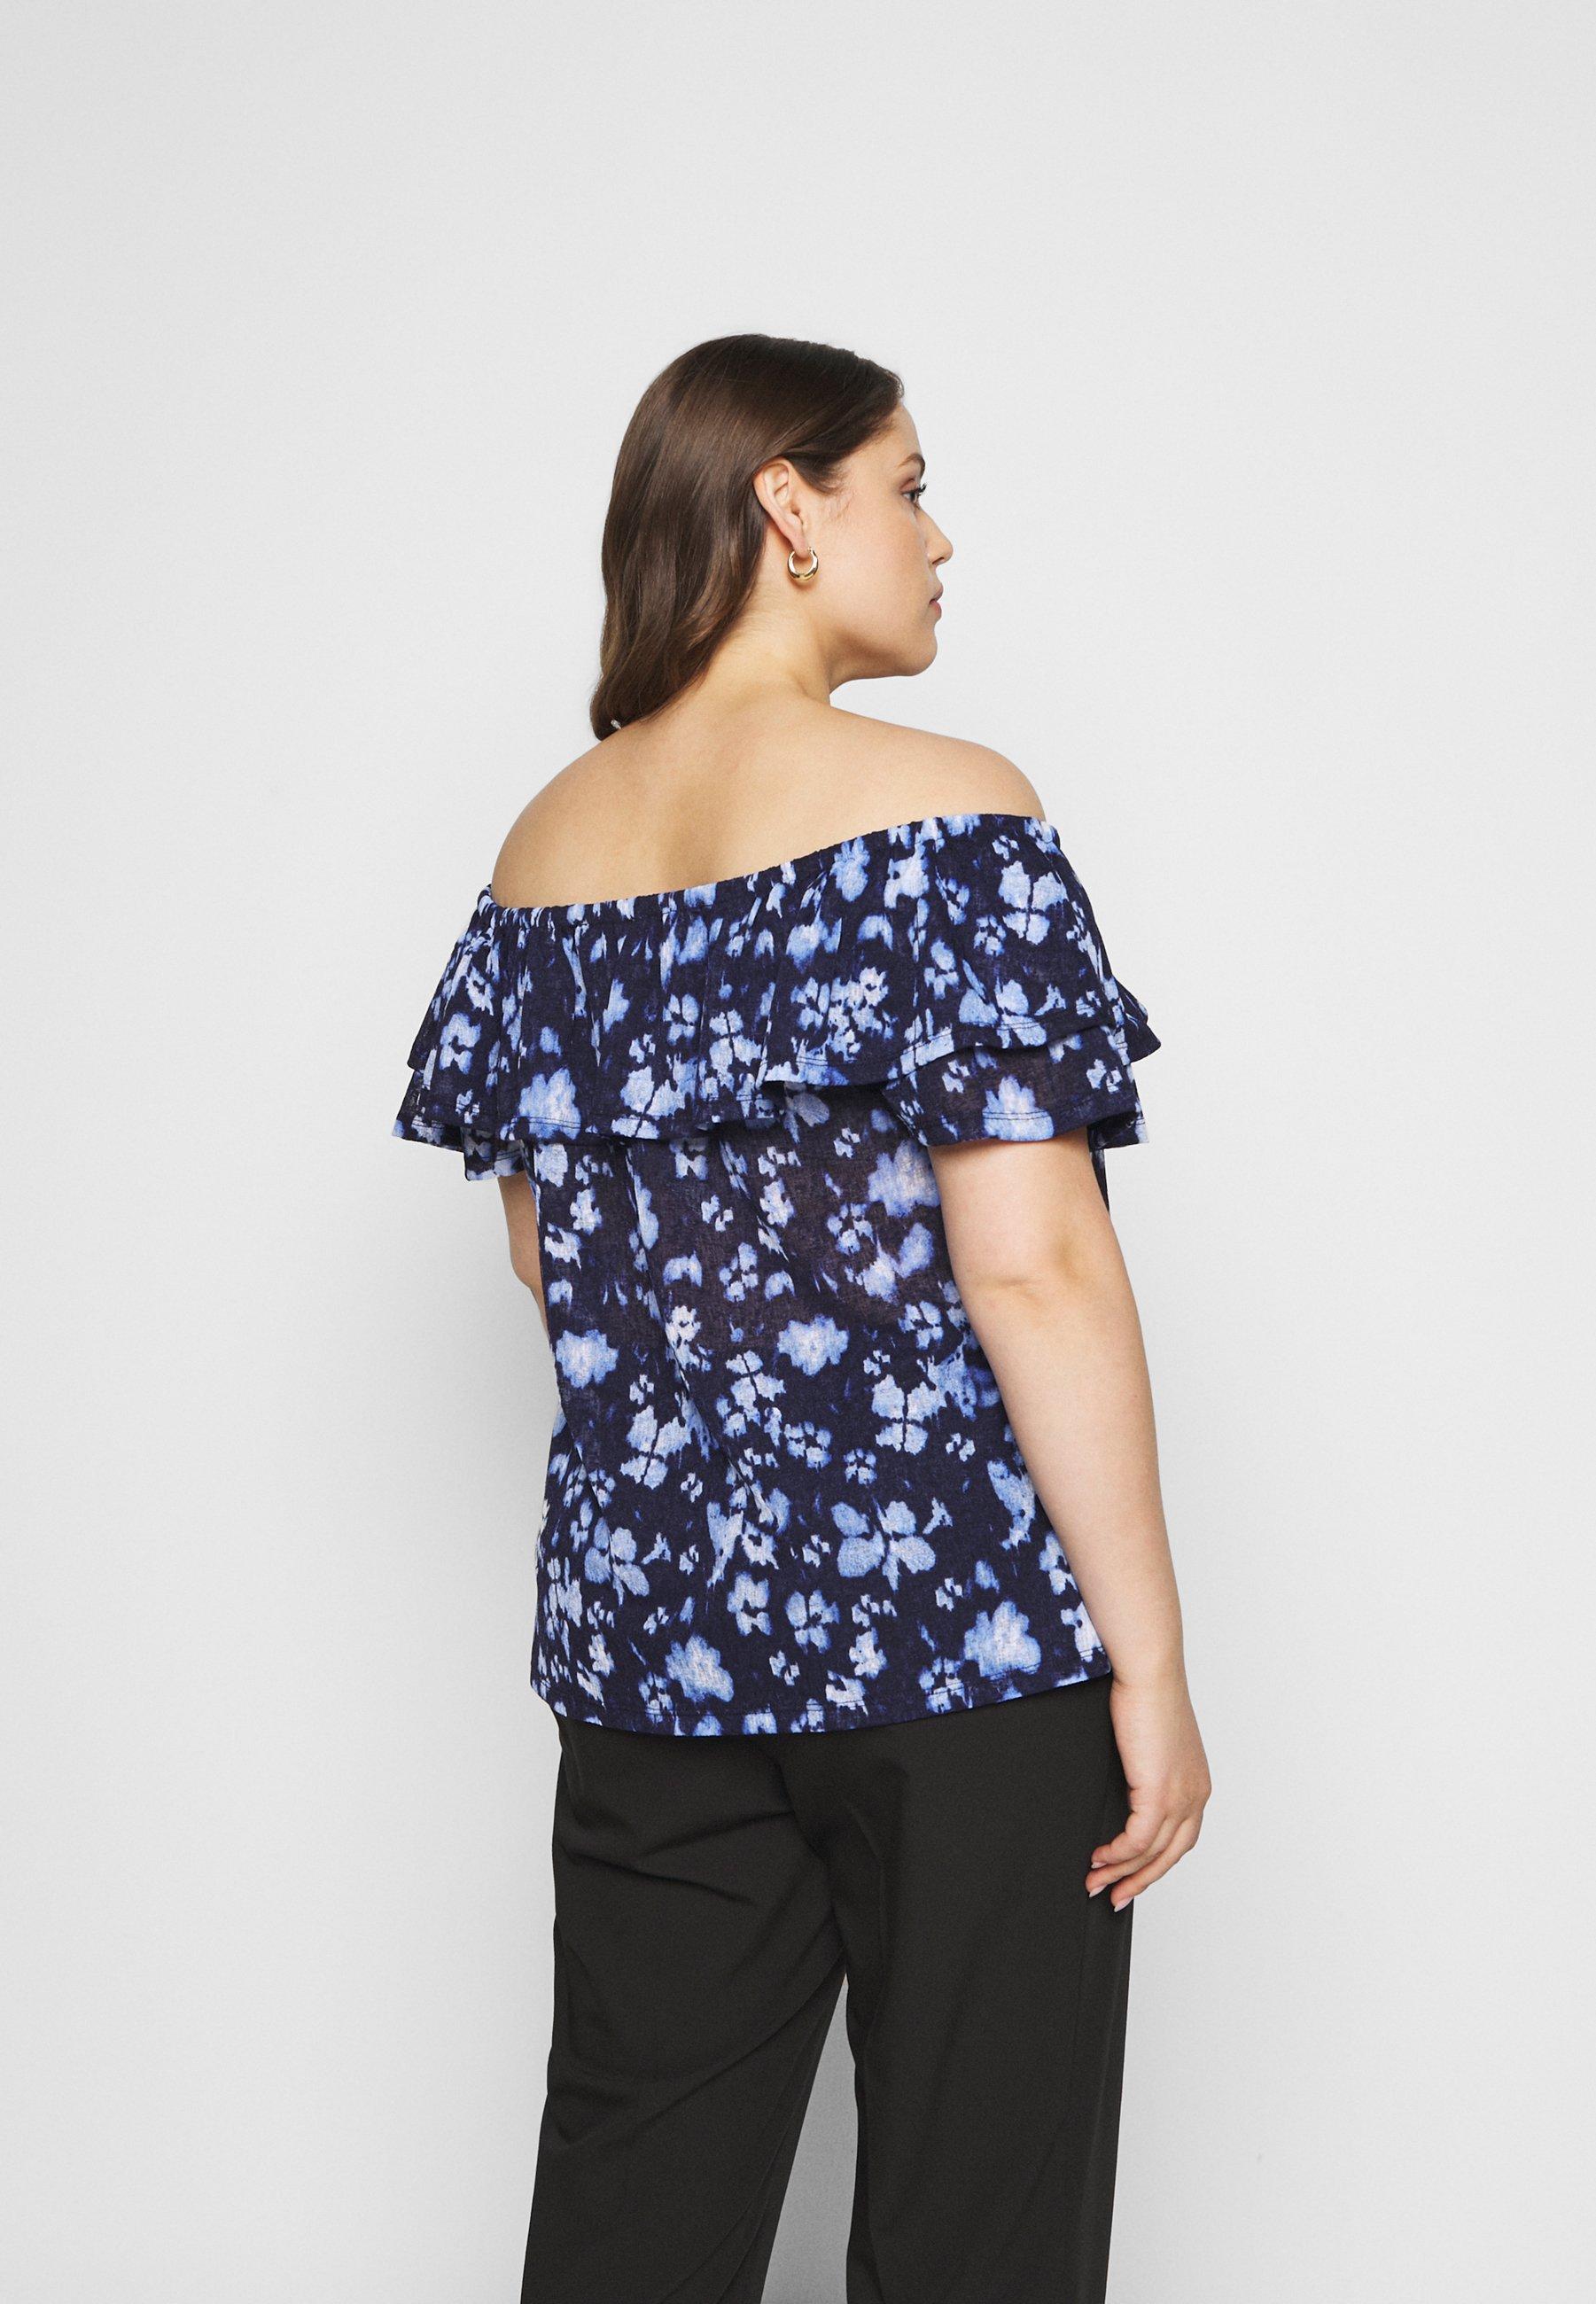 Perfect Women's Clothing MICHAEL Michael Kors POPPY Print T-shirt true navy 0cltZj8AN